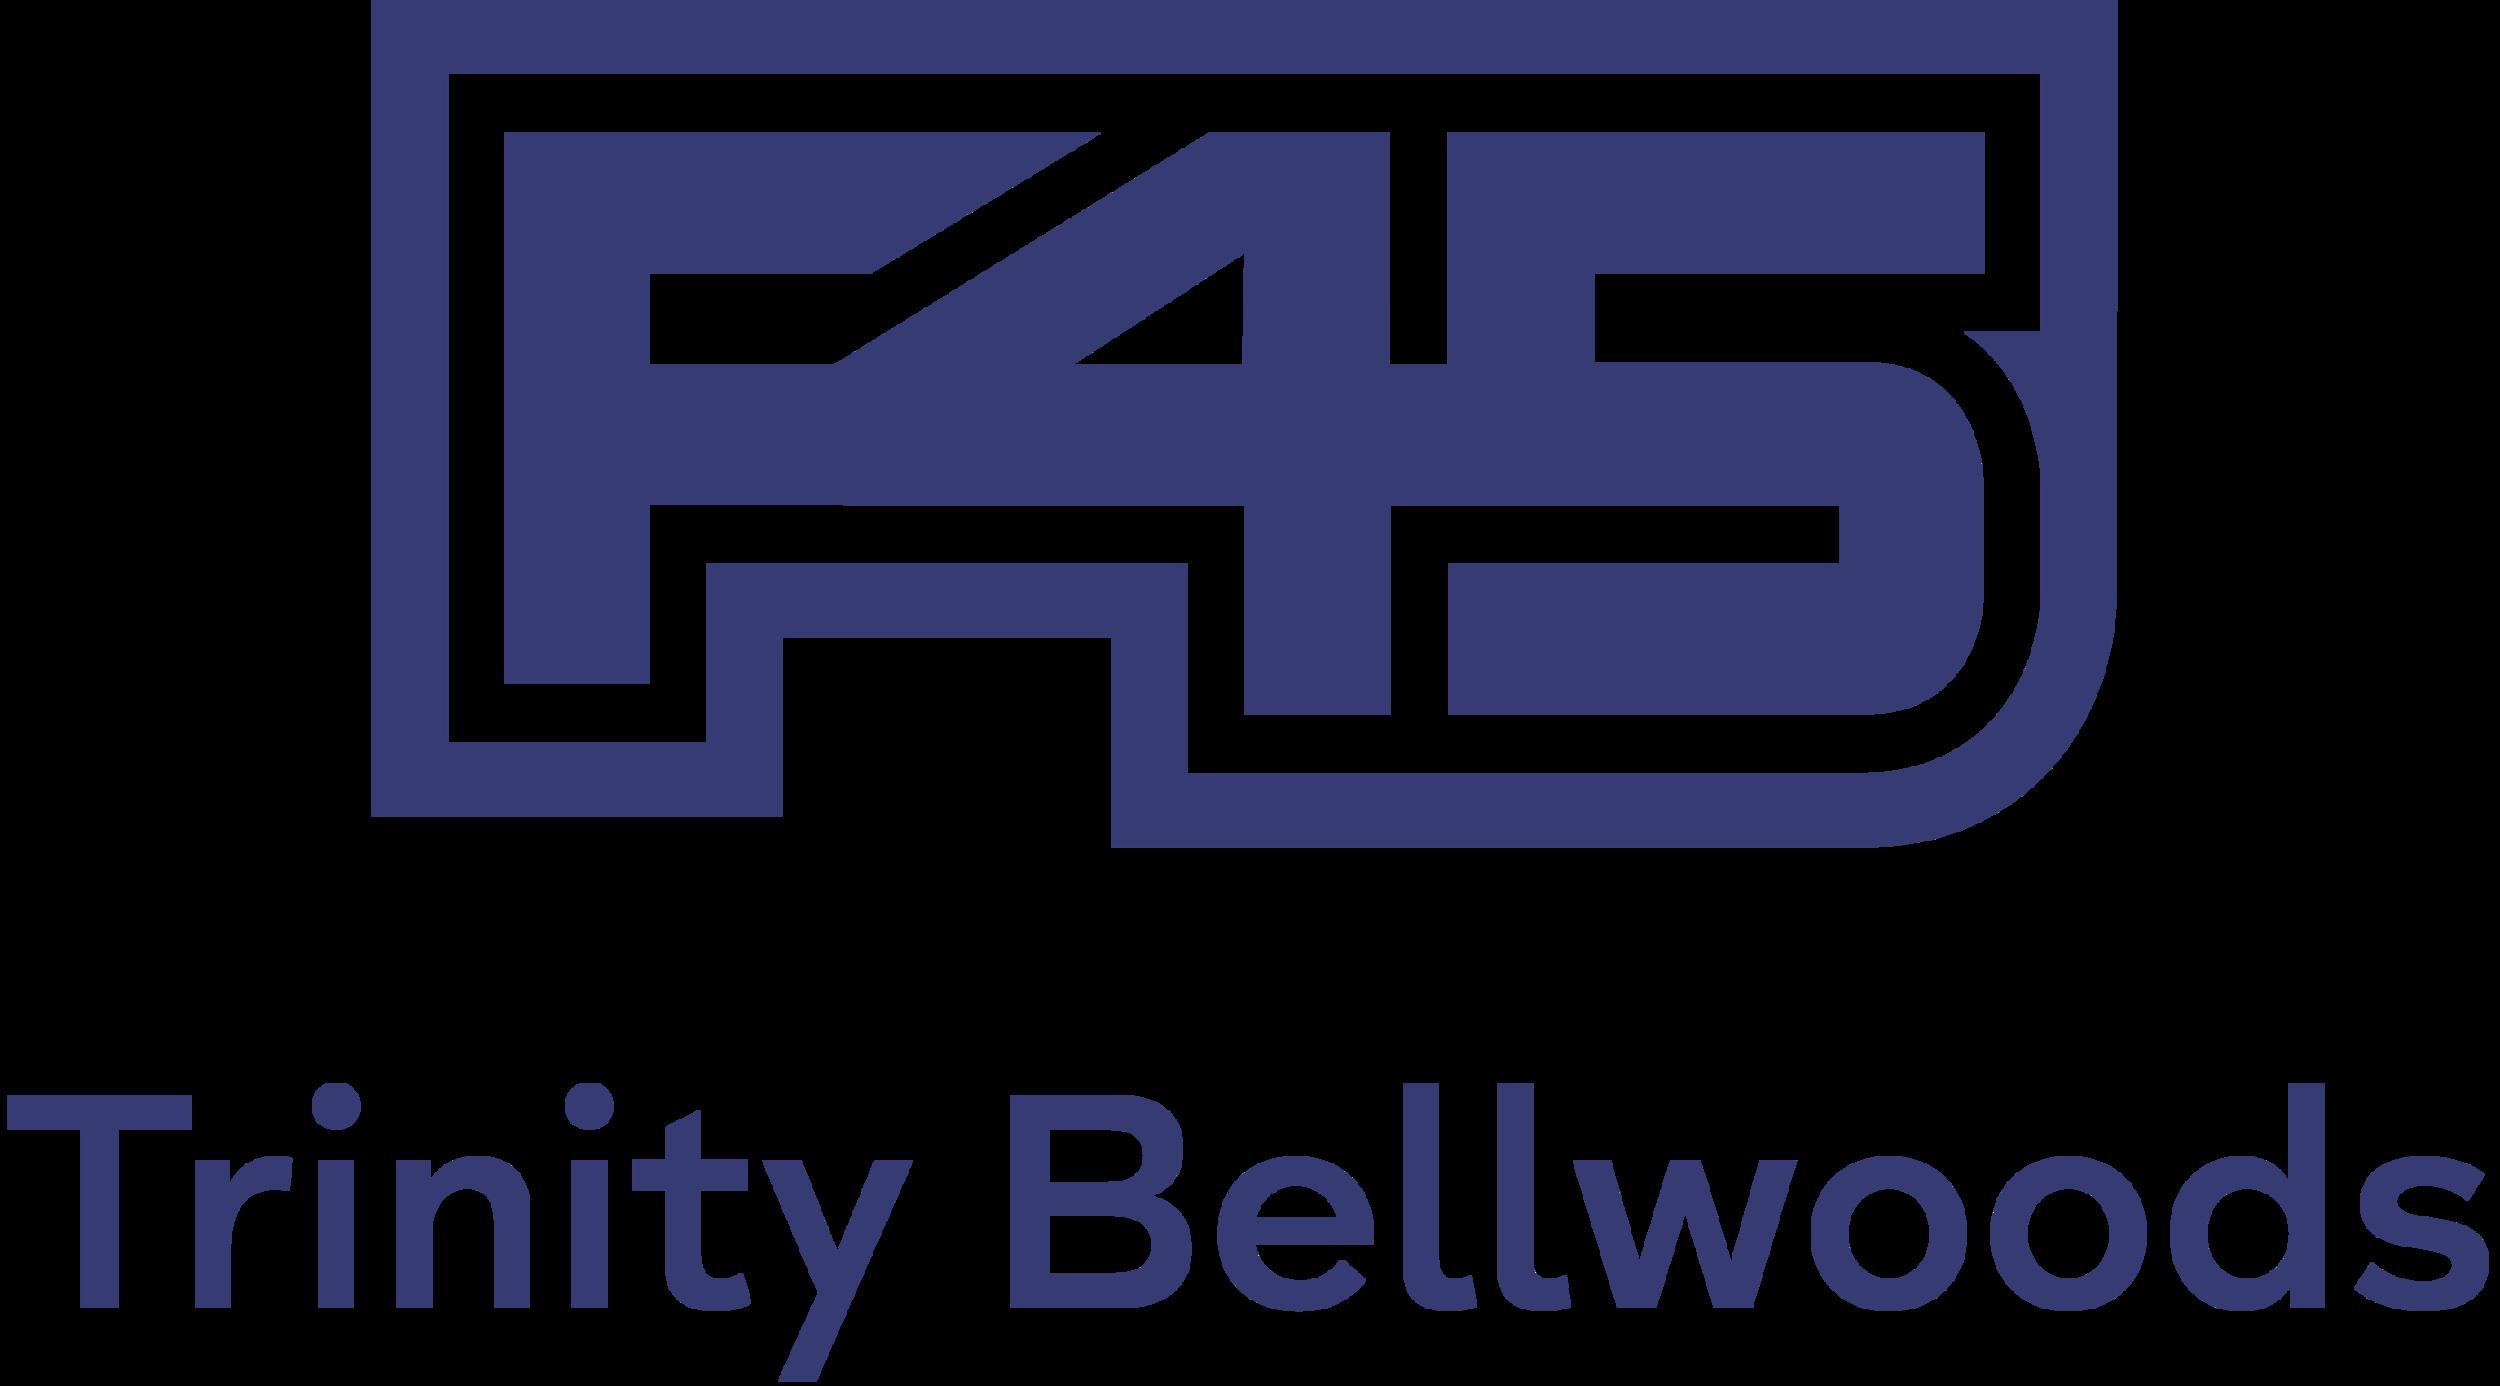 F45_STRIPPED_LOGO_2016_BLUE_BORDER_Trinity Bellwoods (1).png